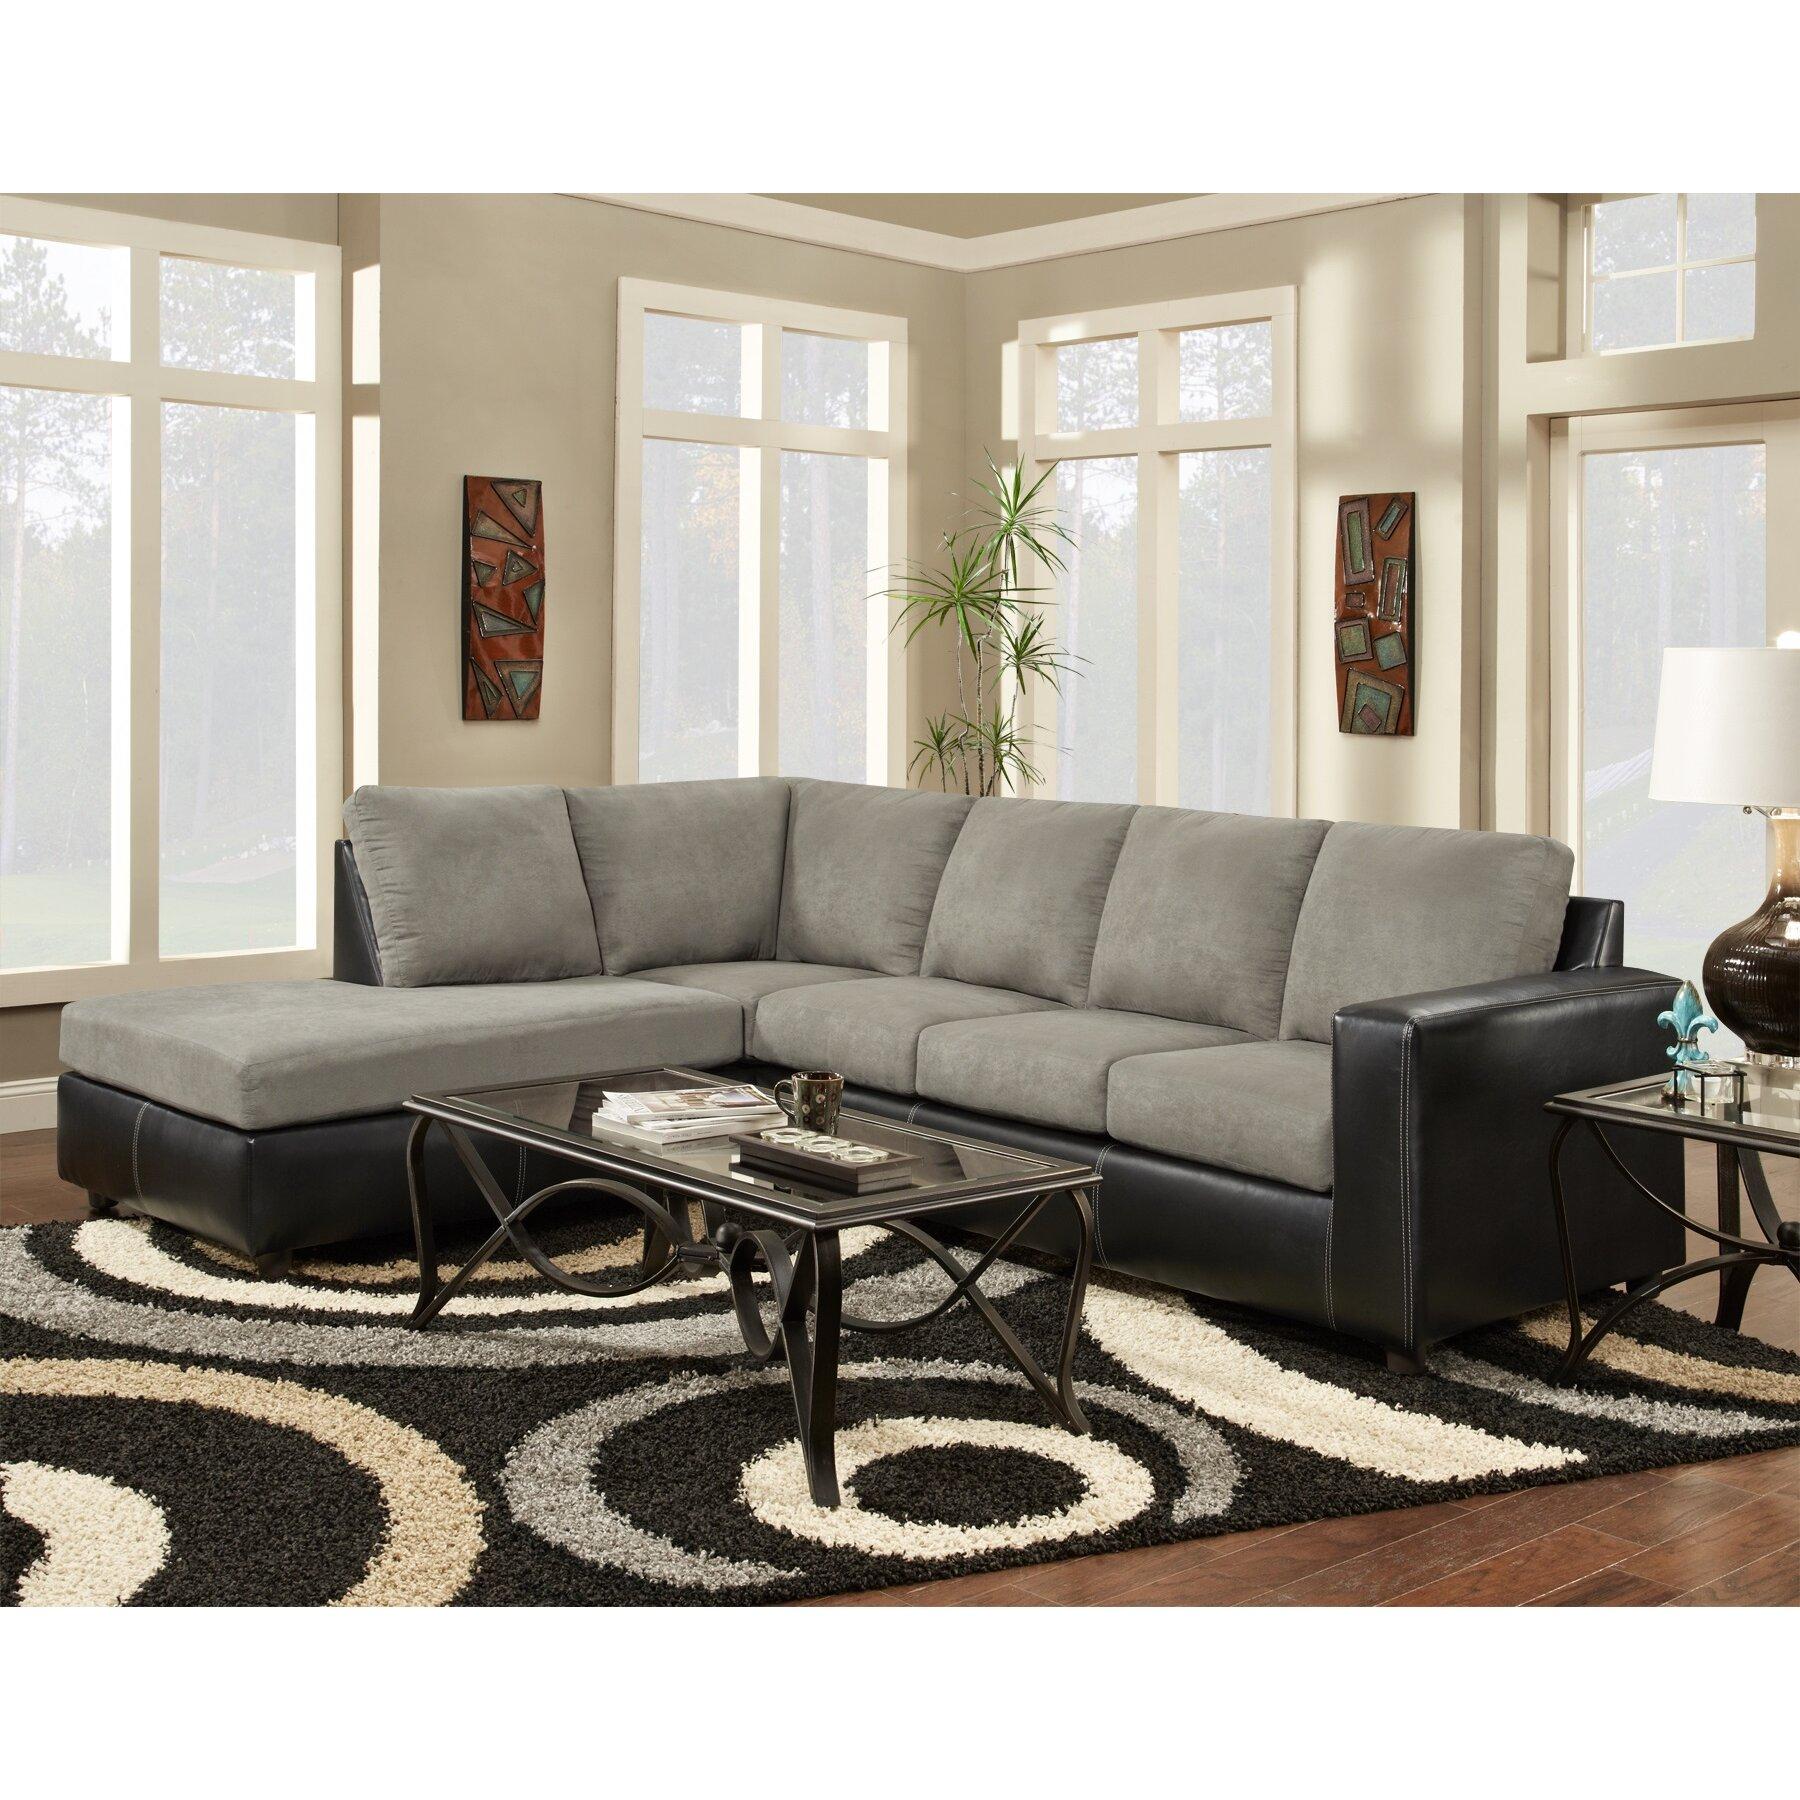 Fitchburg MA Tourism TripAdvisor  Harford Sectional  Chelsea Home  Harford Sectional Reviews Wayfair. Comfort Home Furniture Fitchburg Ma   Kisekae Rakuen com